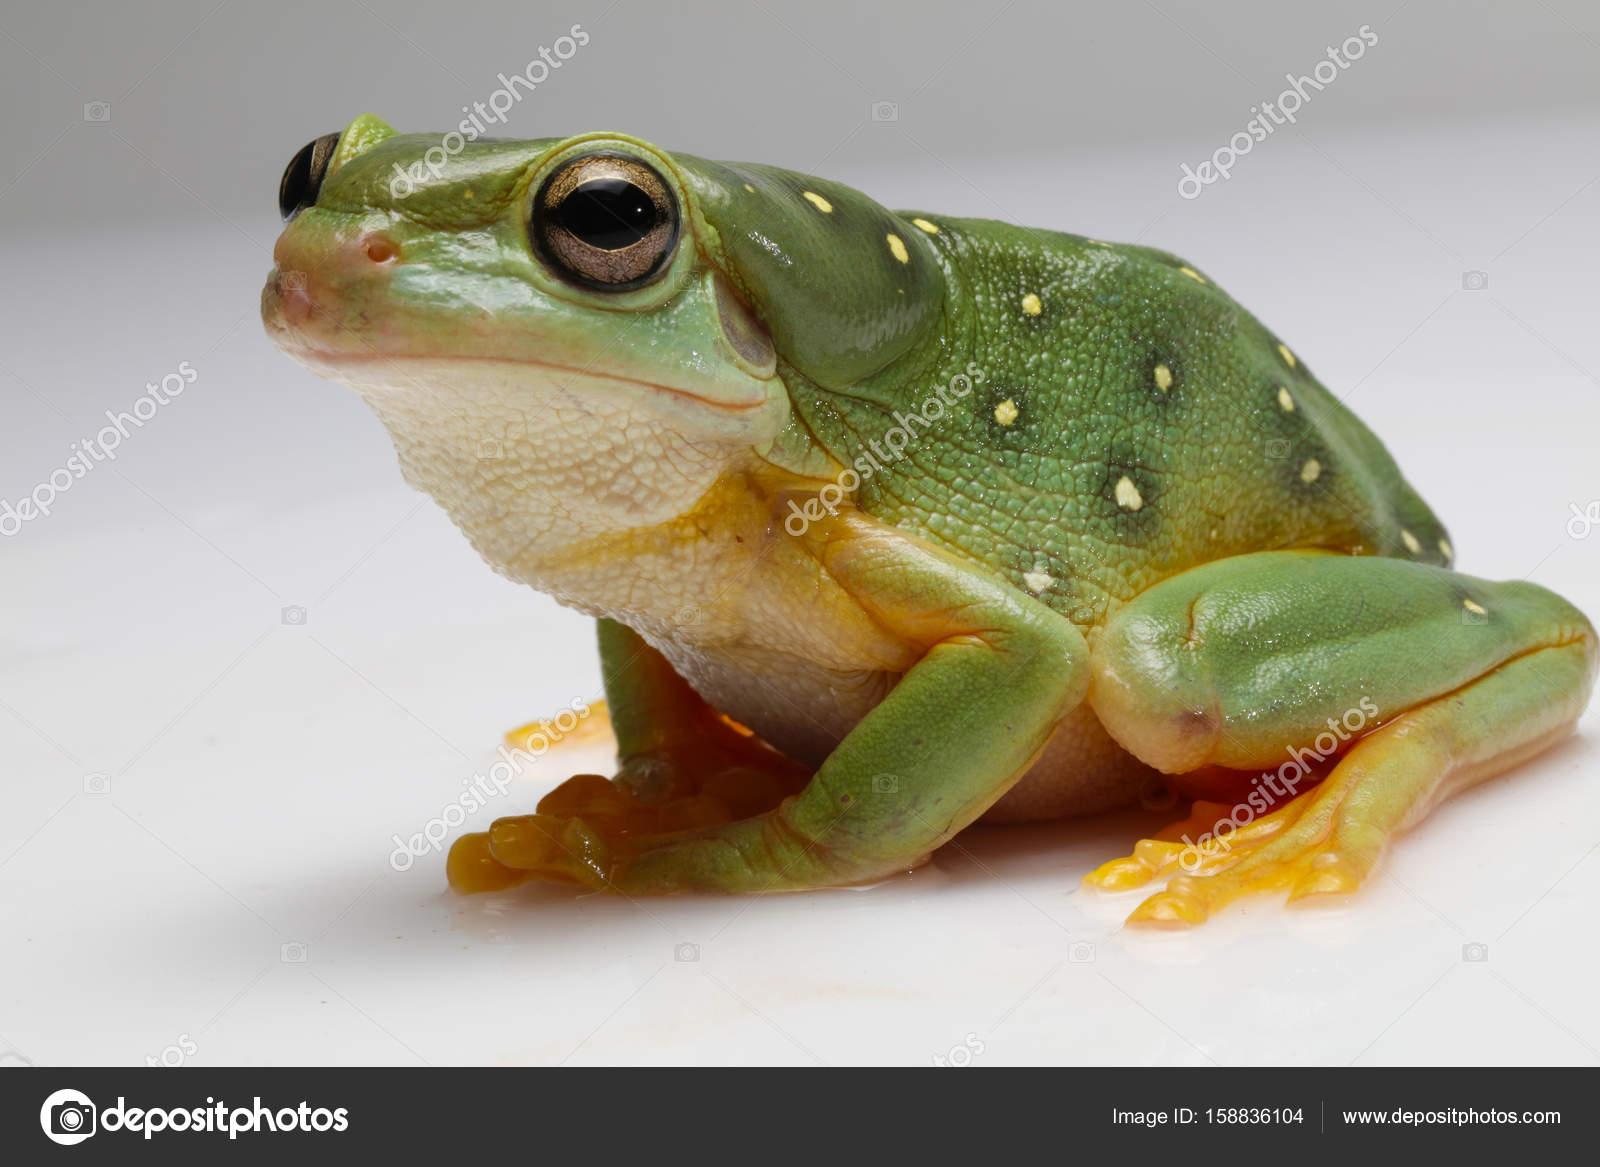 Rana verde con puntos blancos — Foto de stock © sellphoto1 #158836104